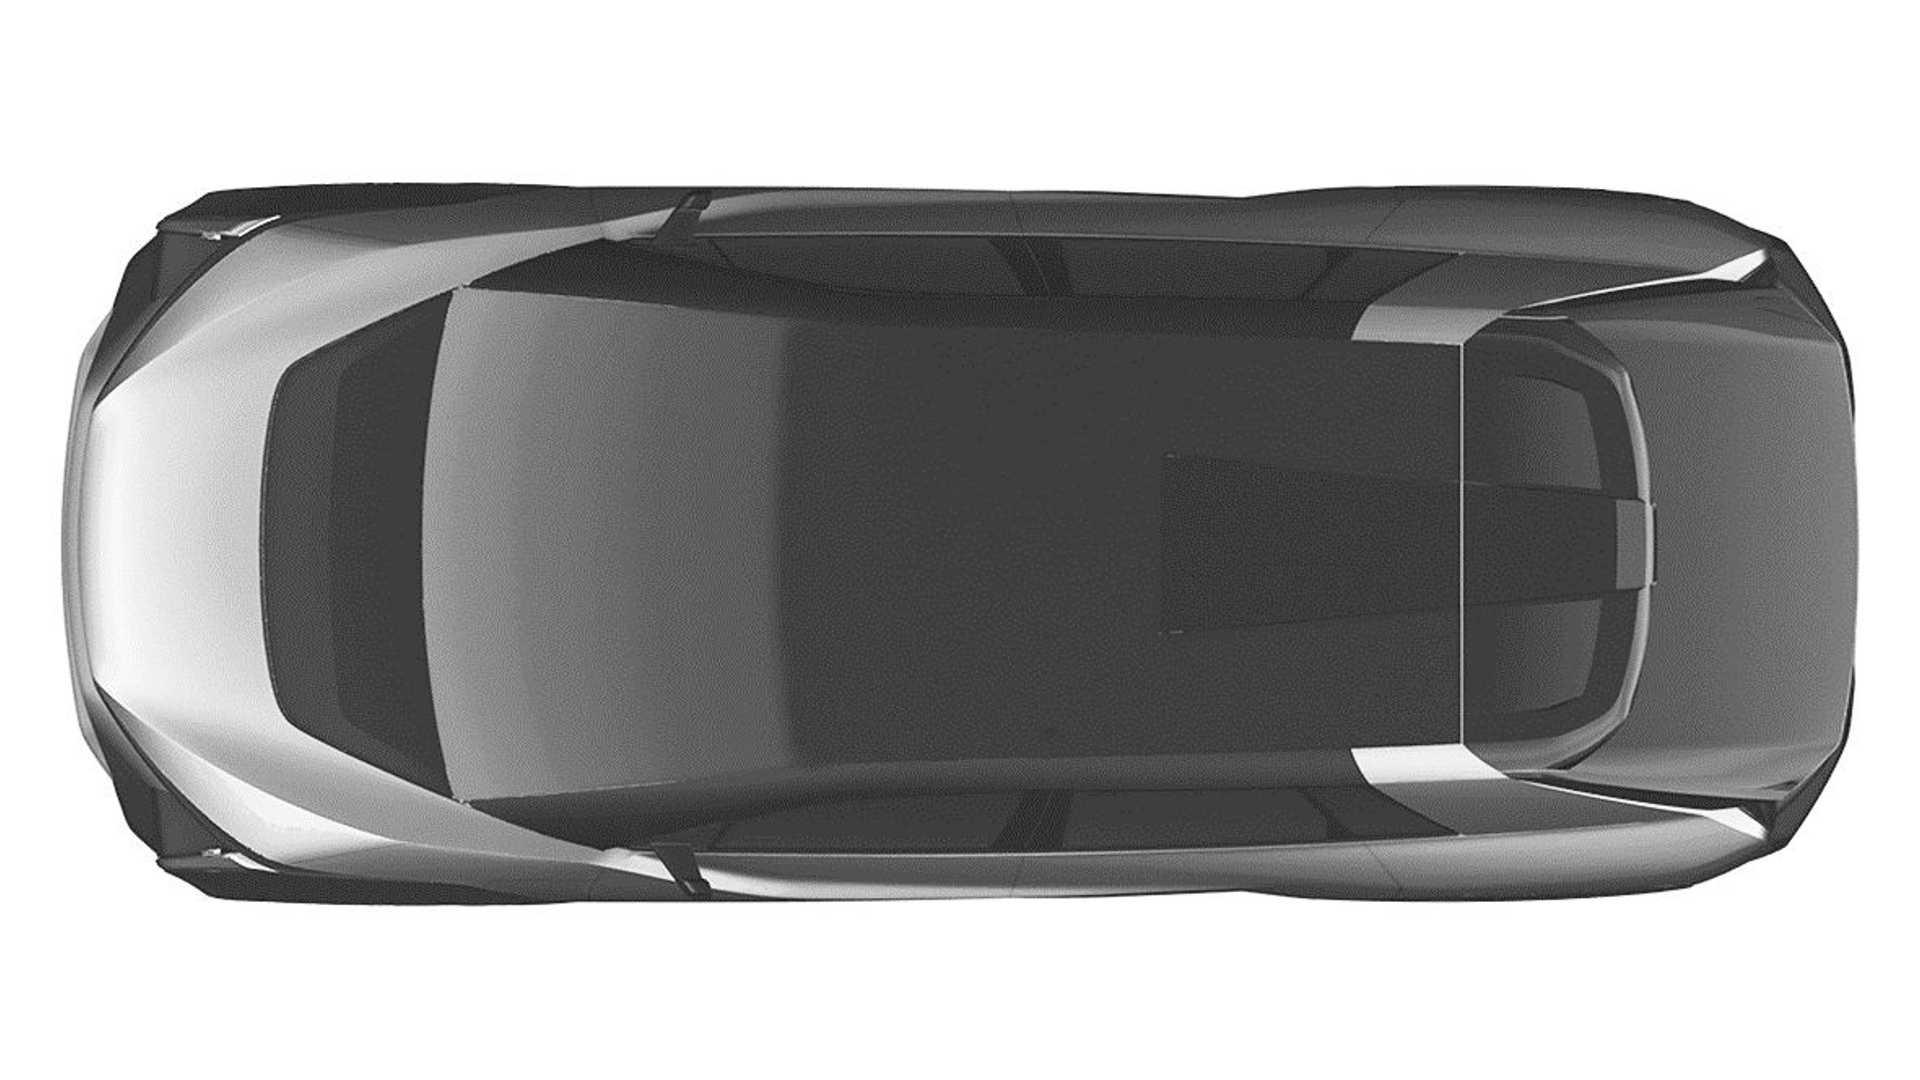 Toyota-Crossover-Design-Trademark-patents-7